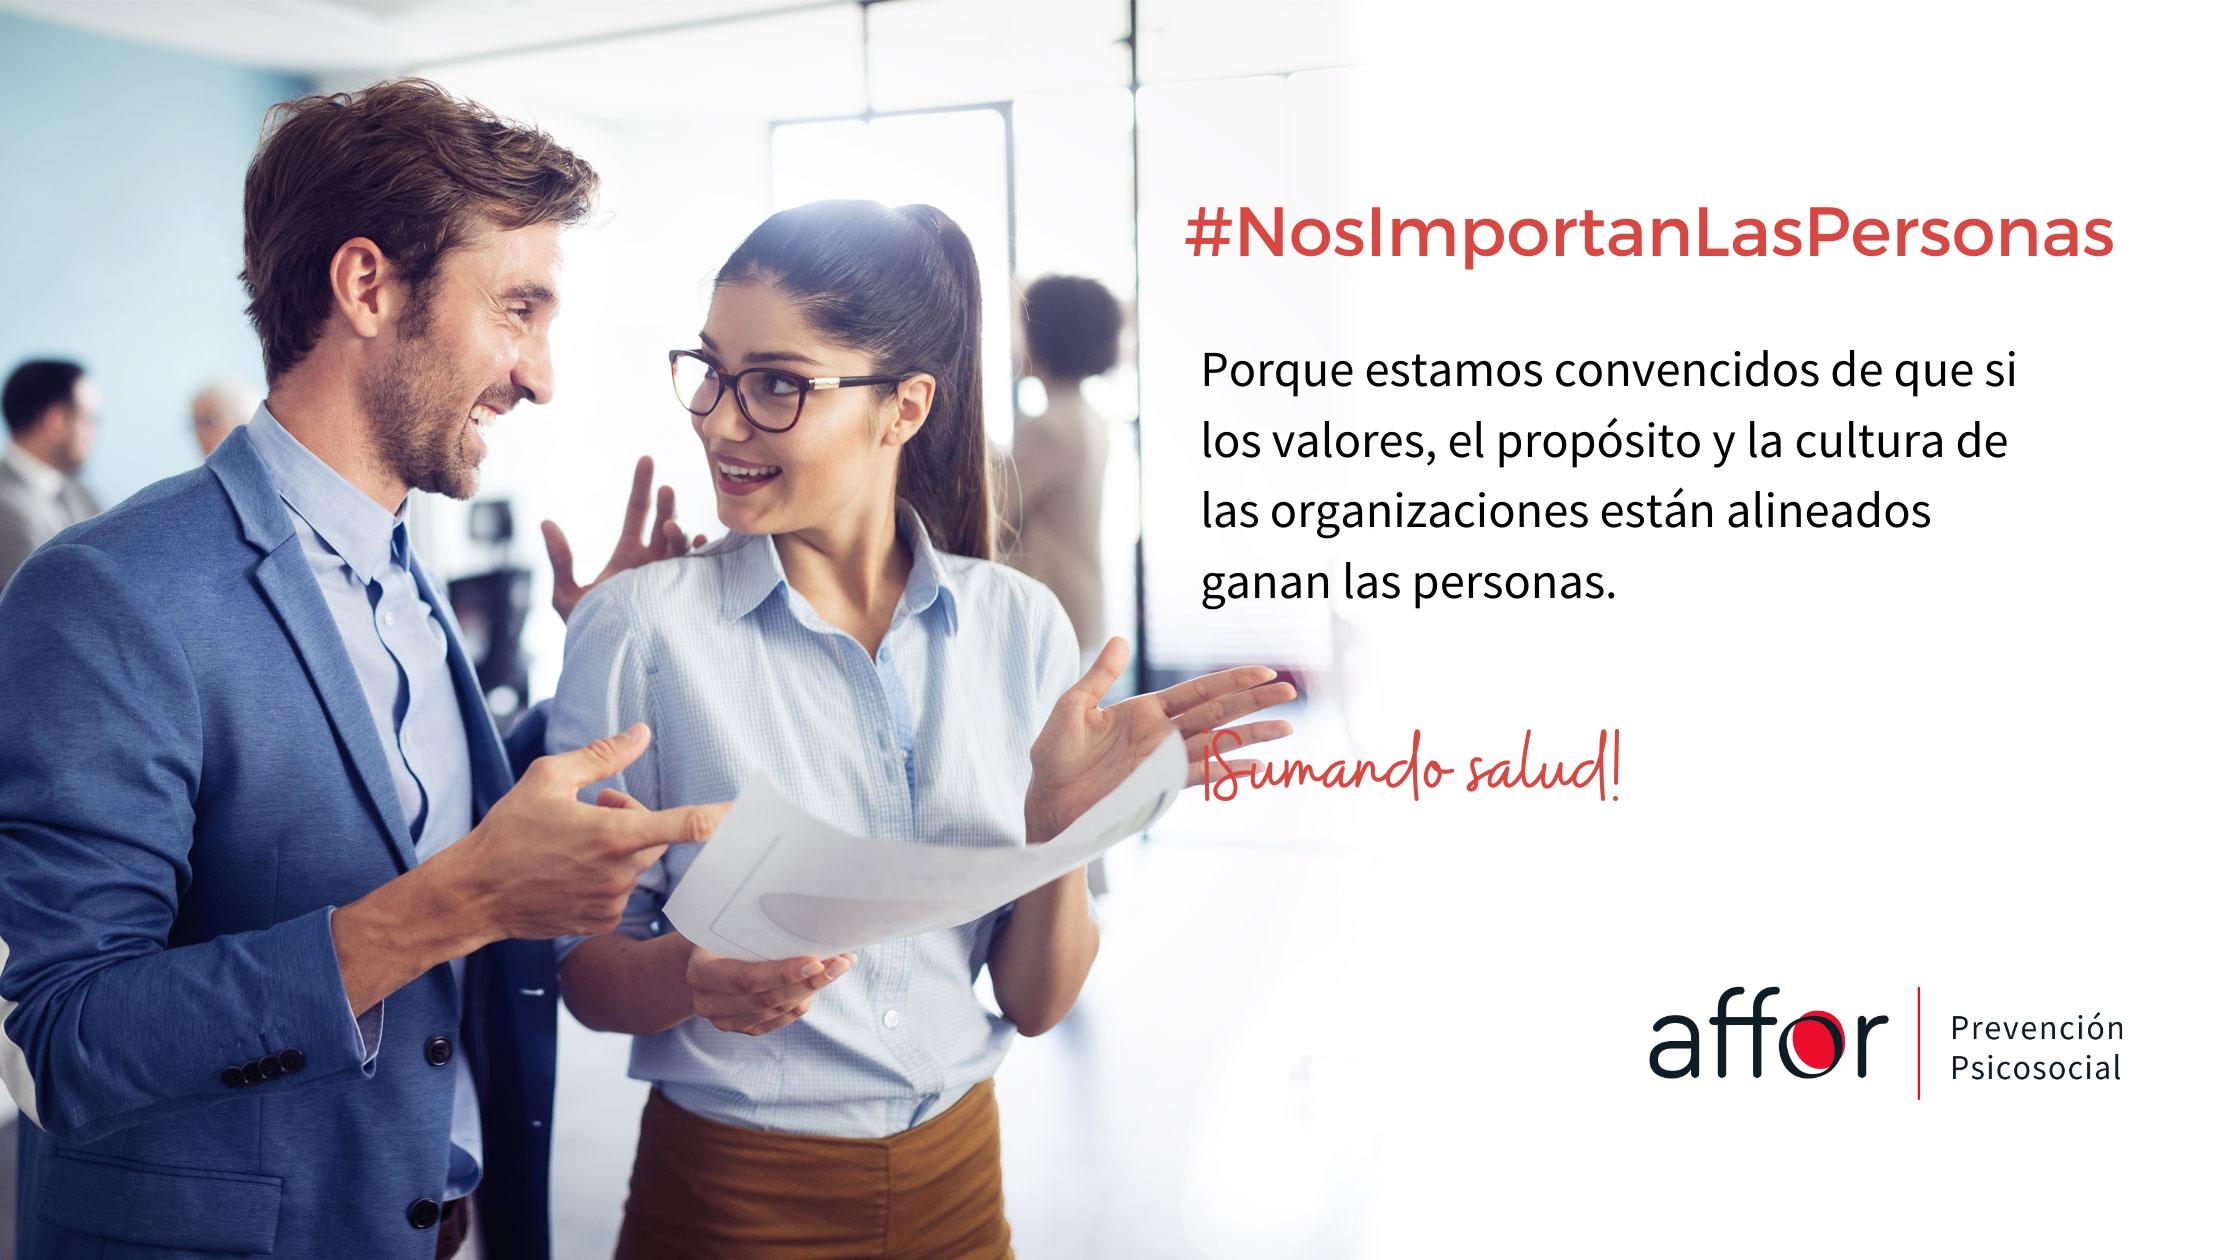 #NosImportanLasPersonas